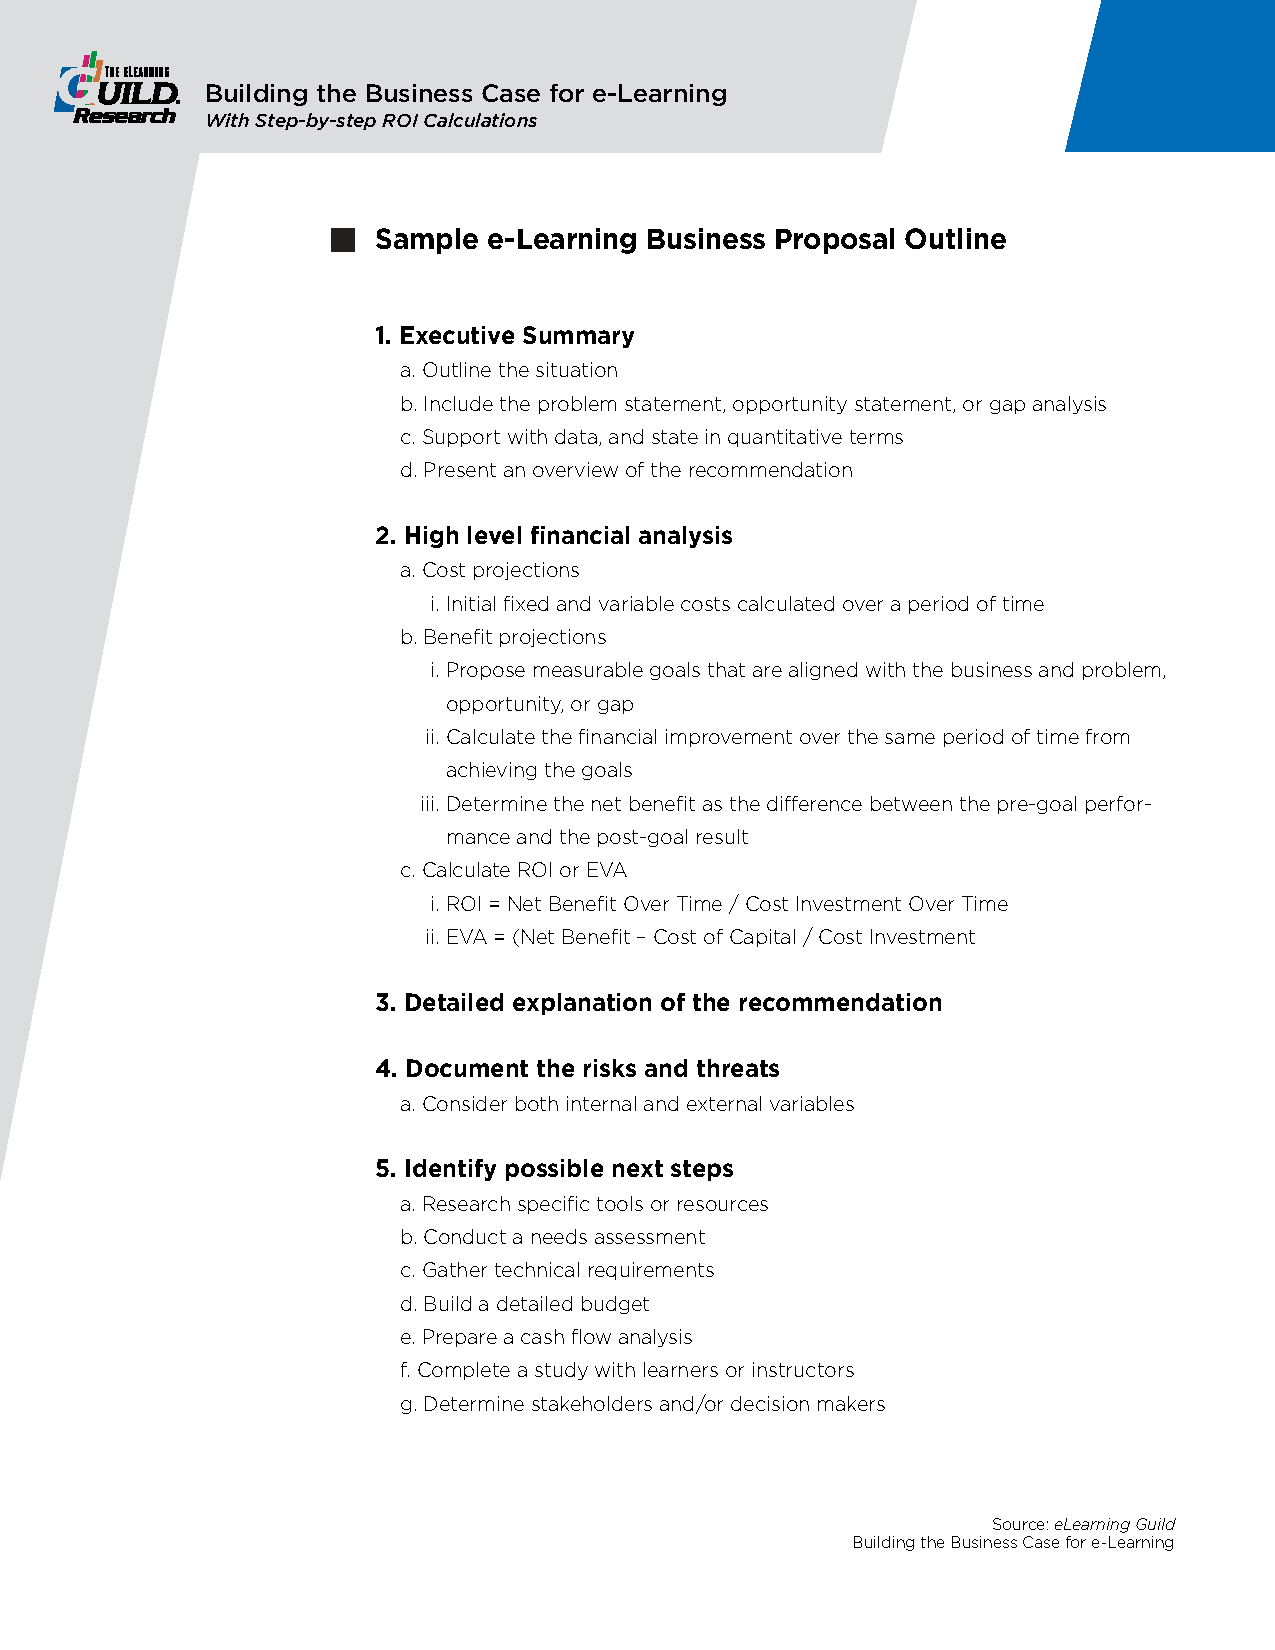 Sample Business Proposal Outline